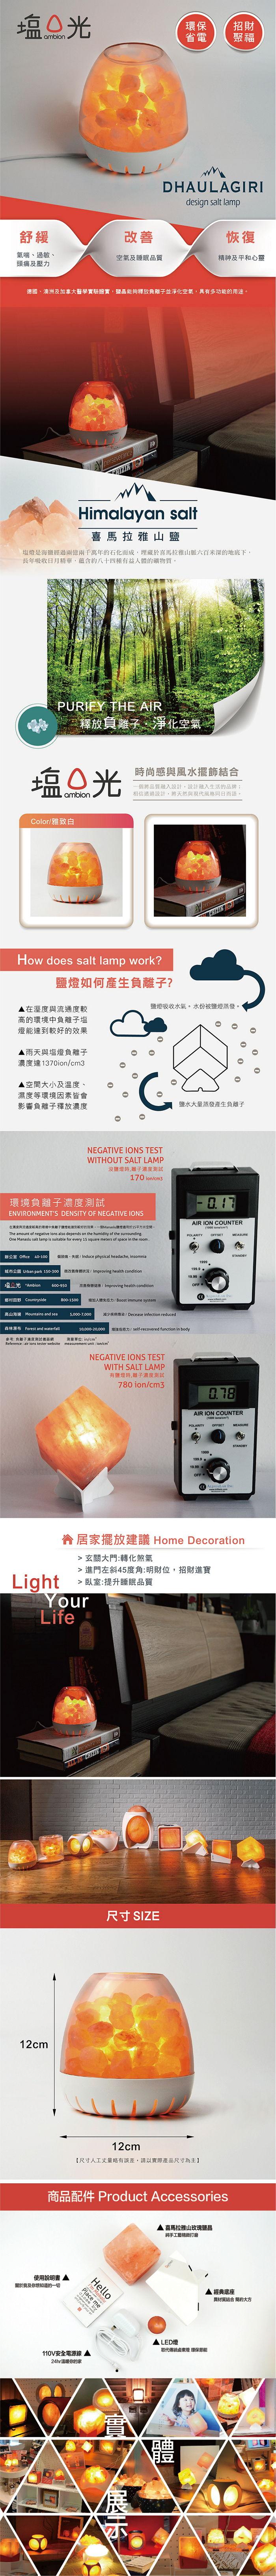 (複製)Ambion | 精油座LED玫瑰鹽晶燈 (Lhotse/白)